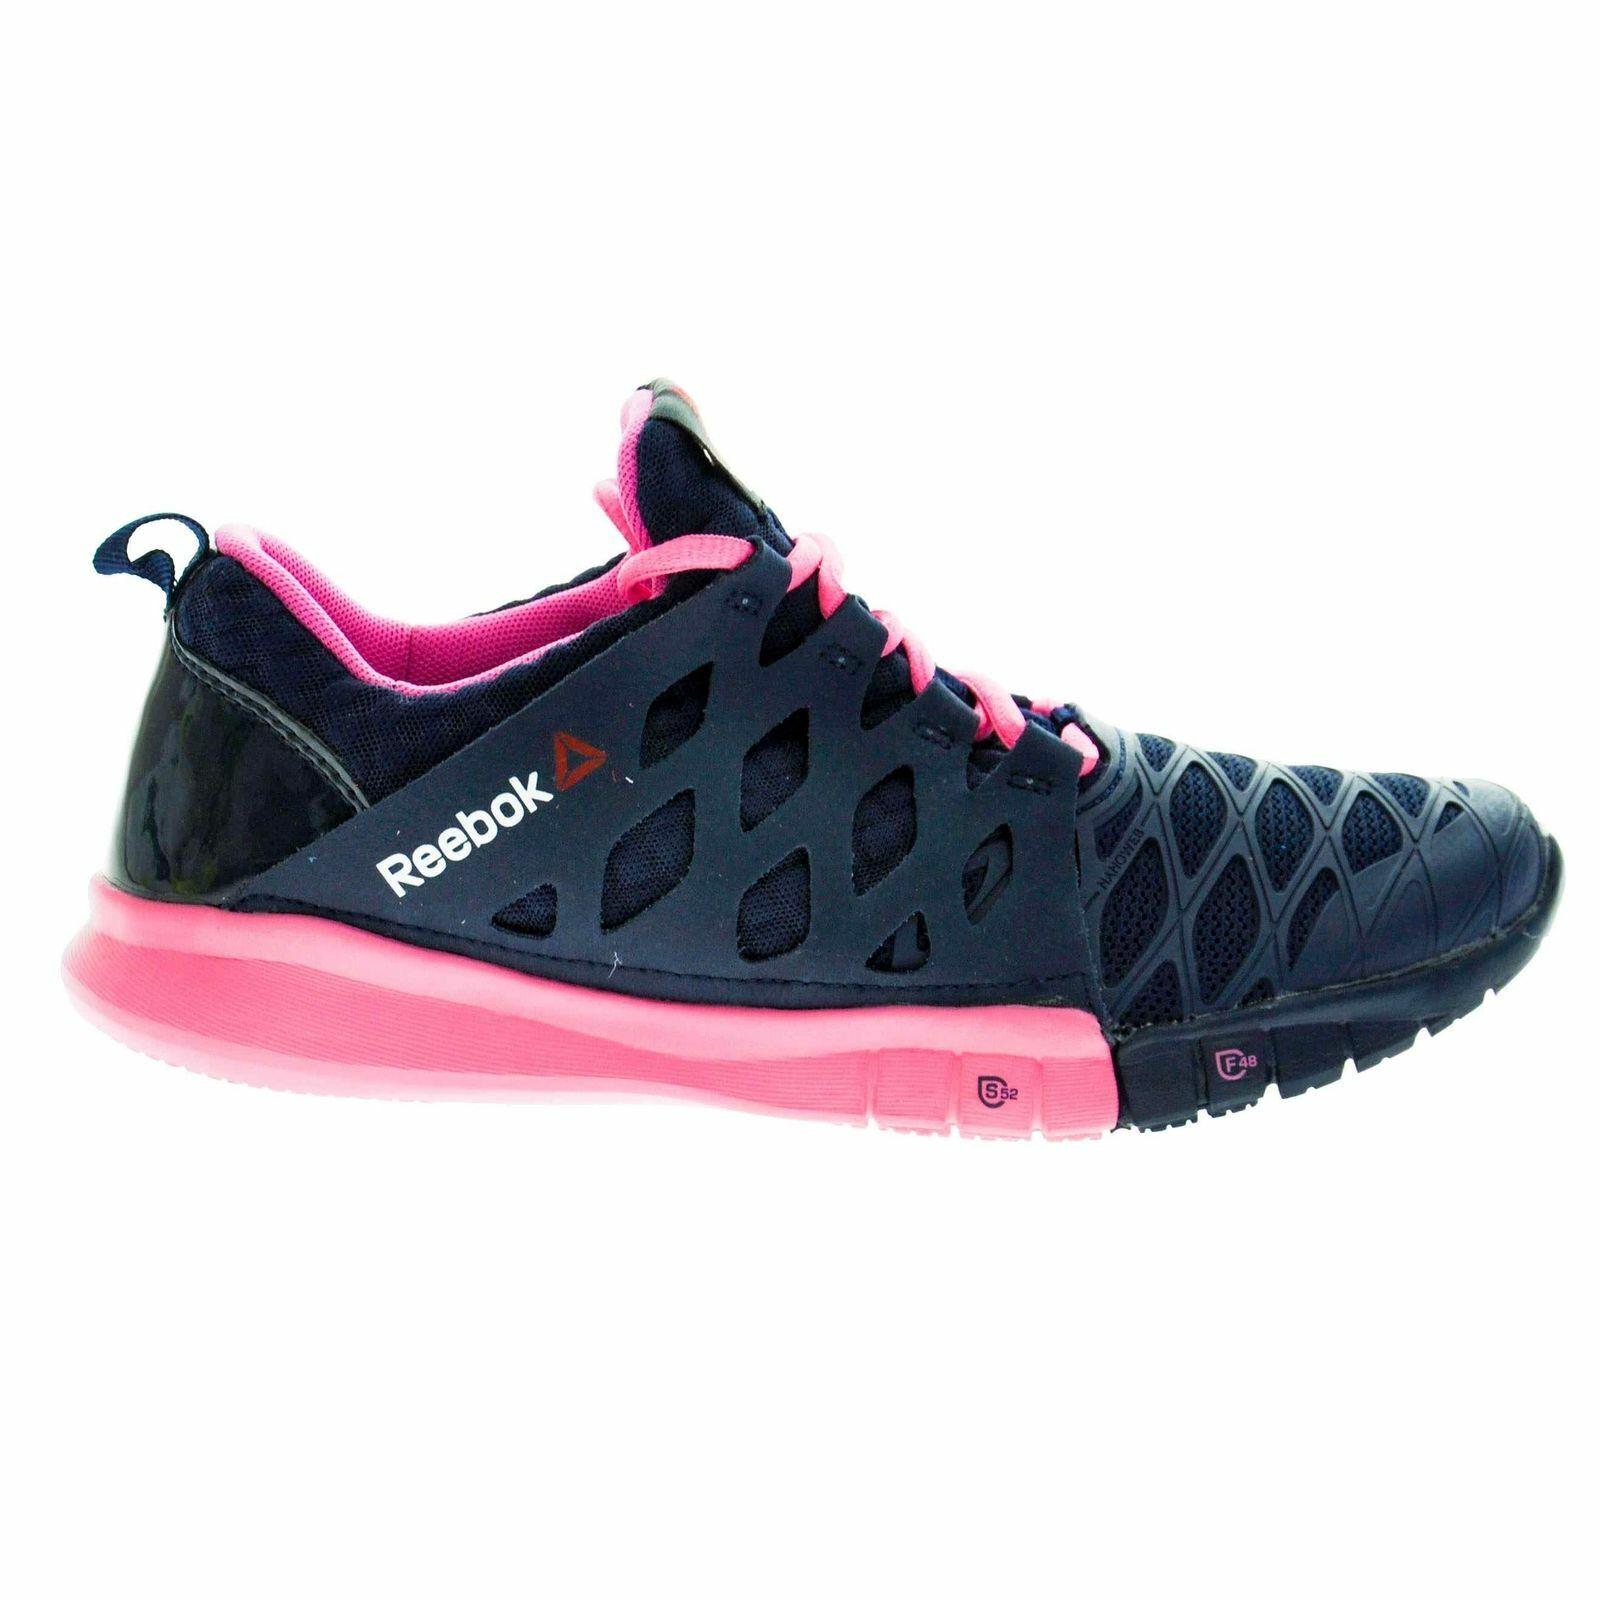 REEBOKWomen's Training shoesZRX TRSize 7 USAM43625Navy Electro Pink PinkNEW